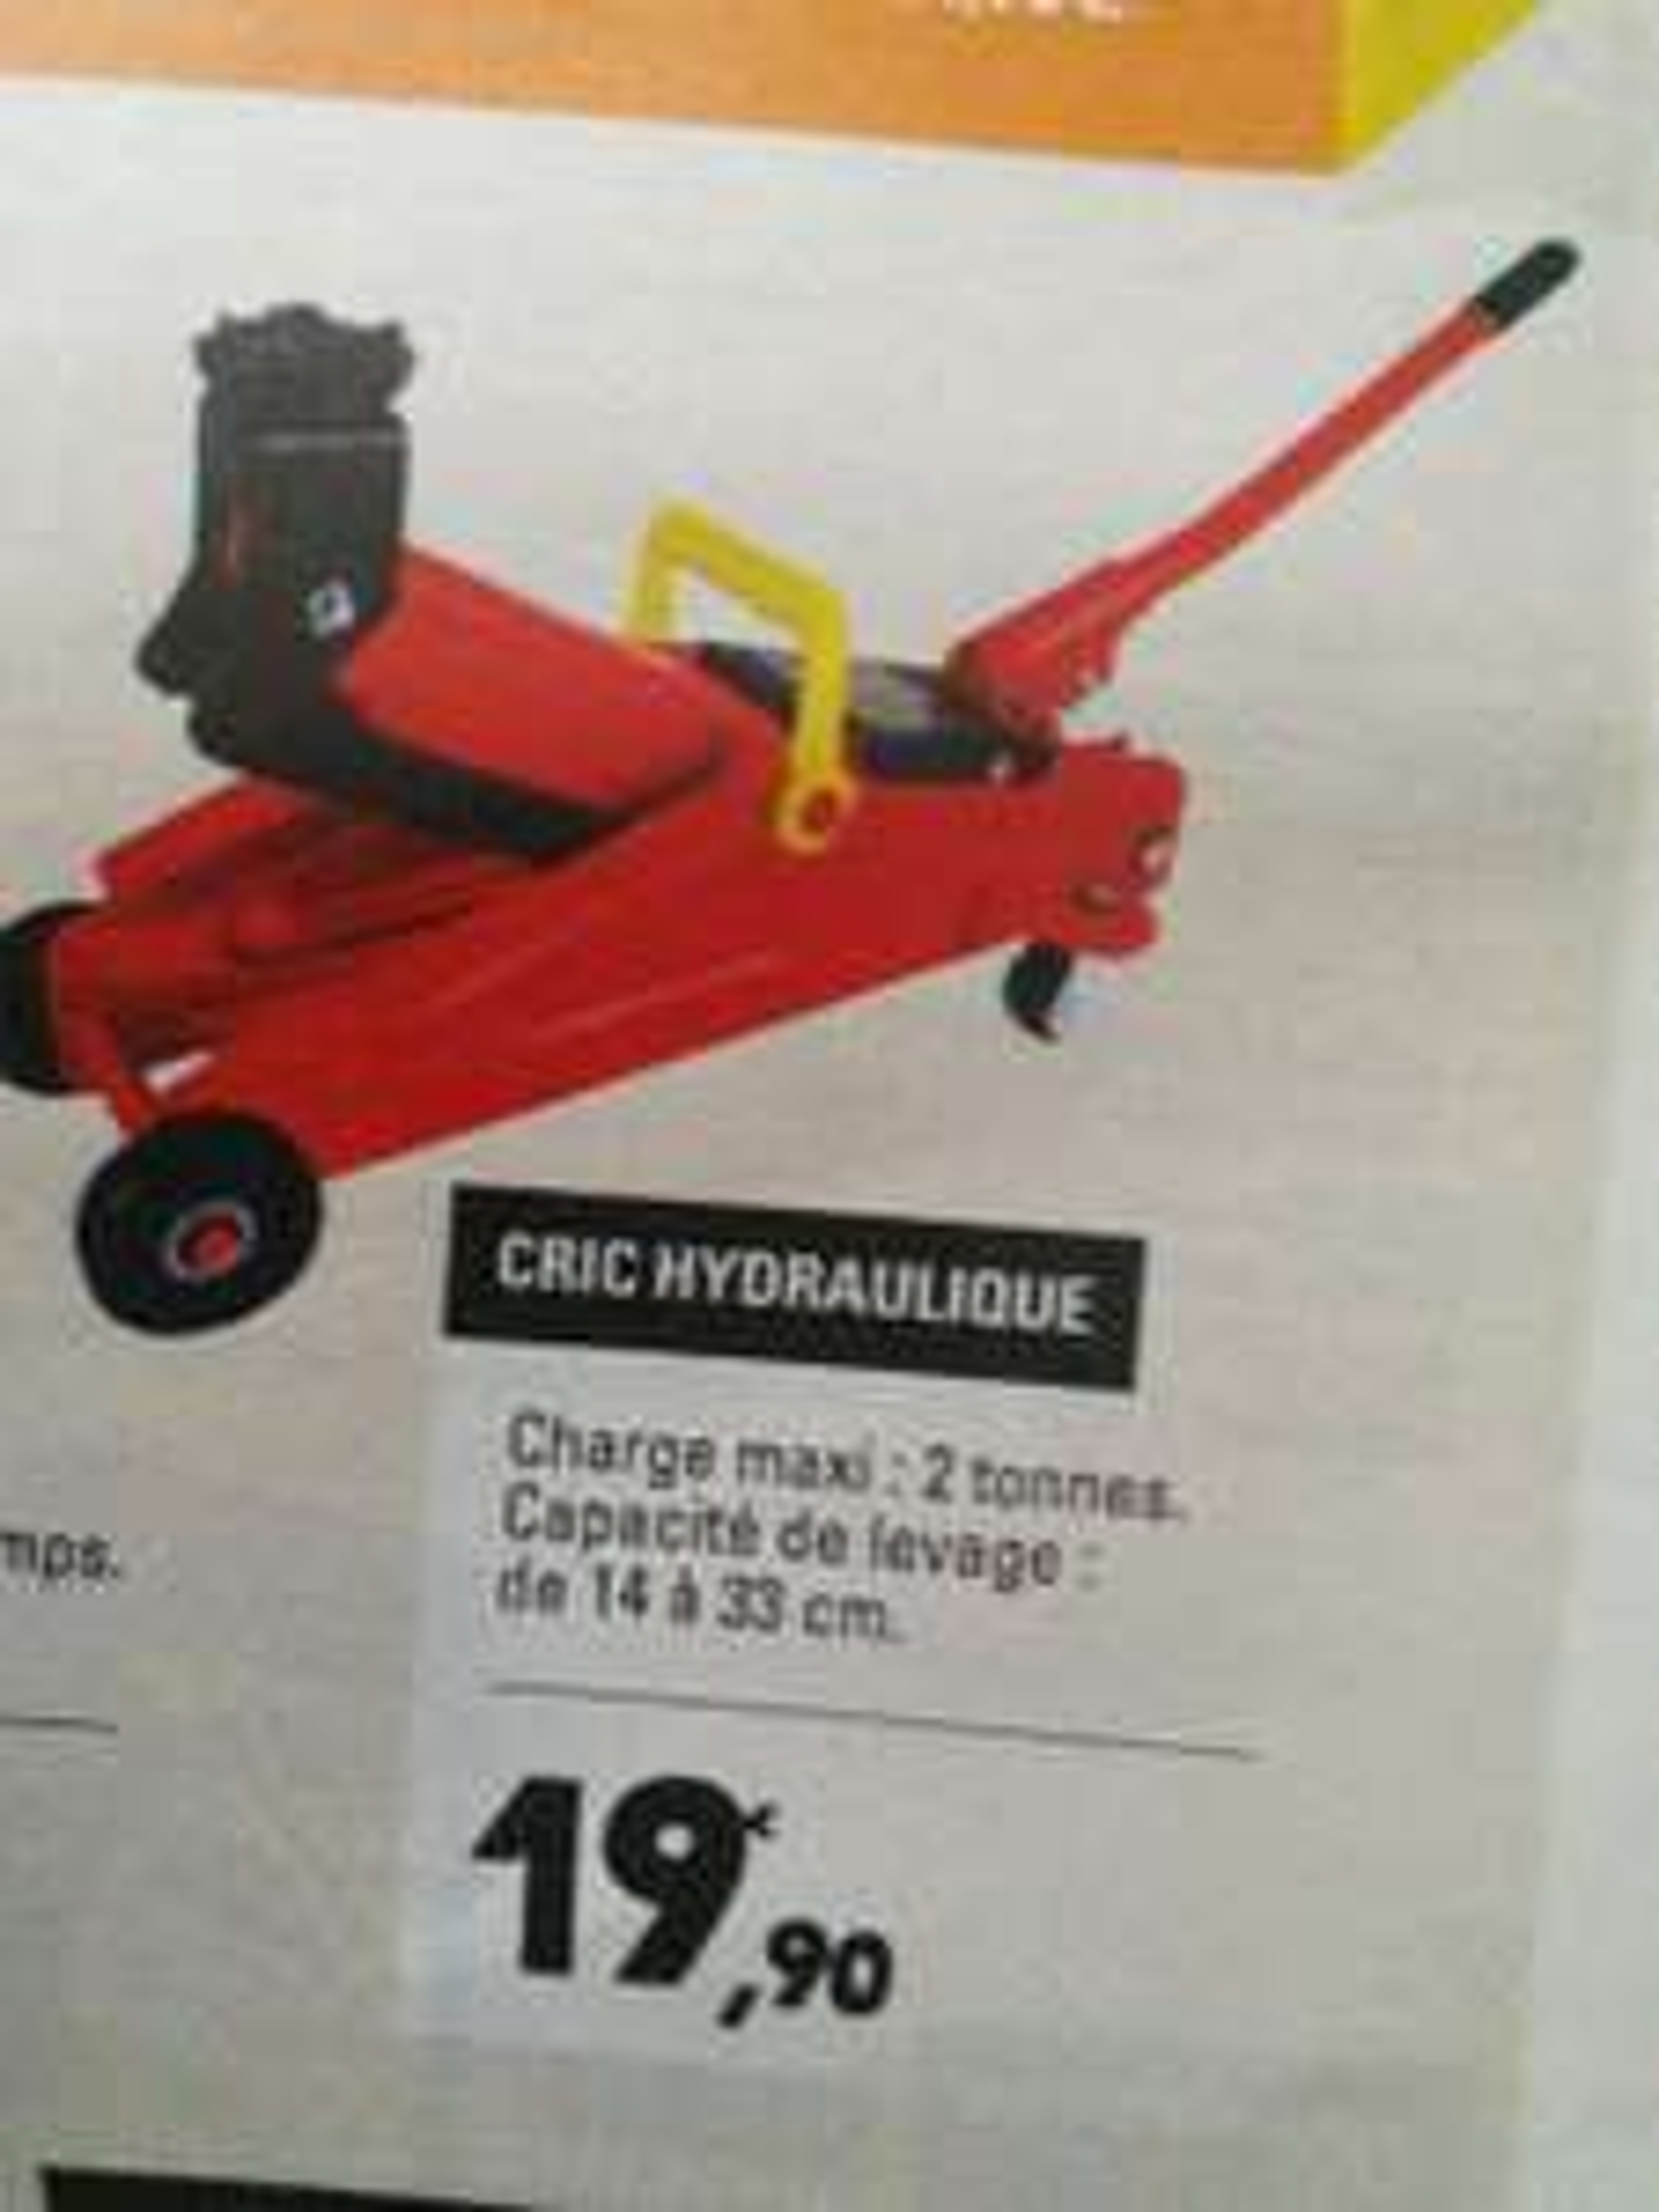 Cric hydraulique (char max : 2 Tonnes)